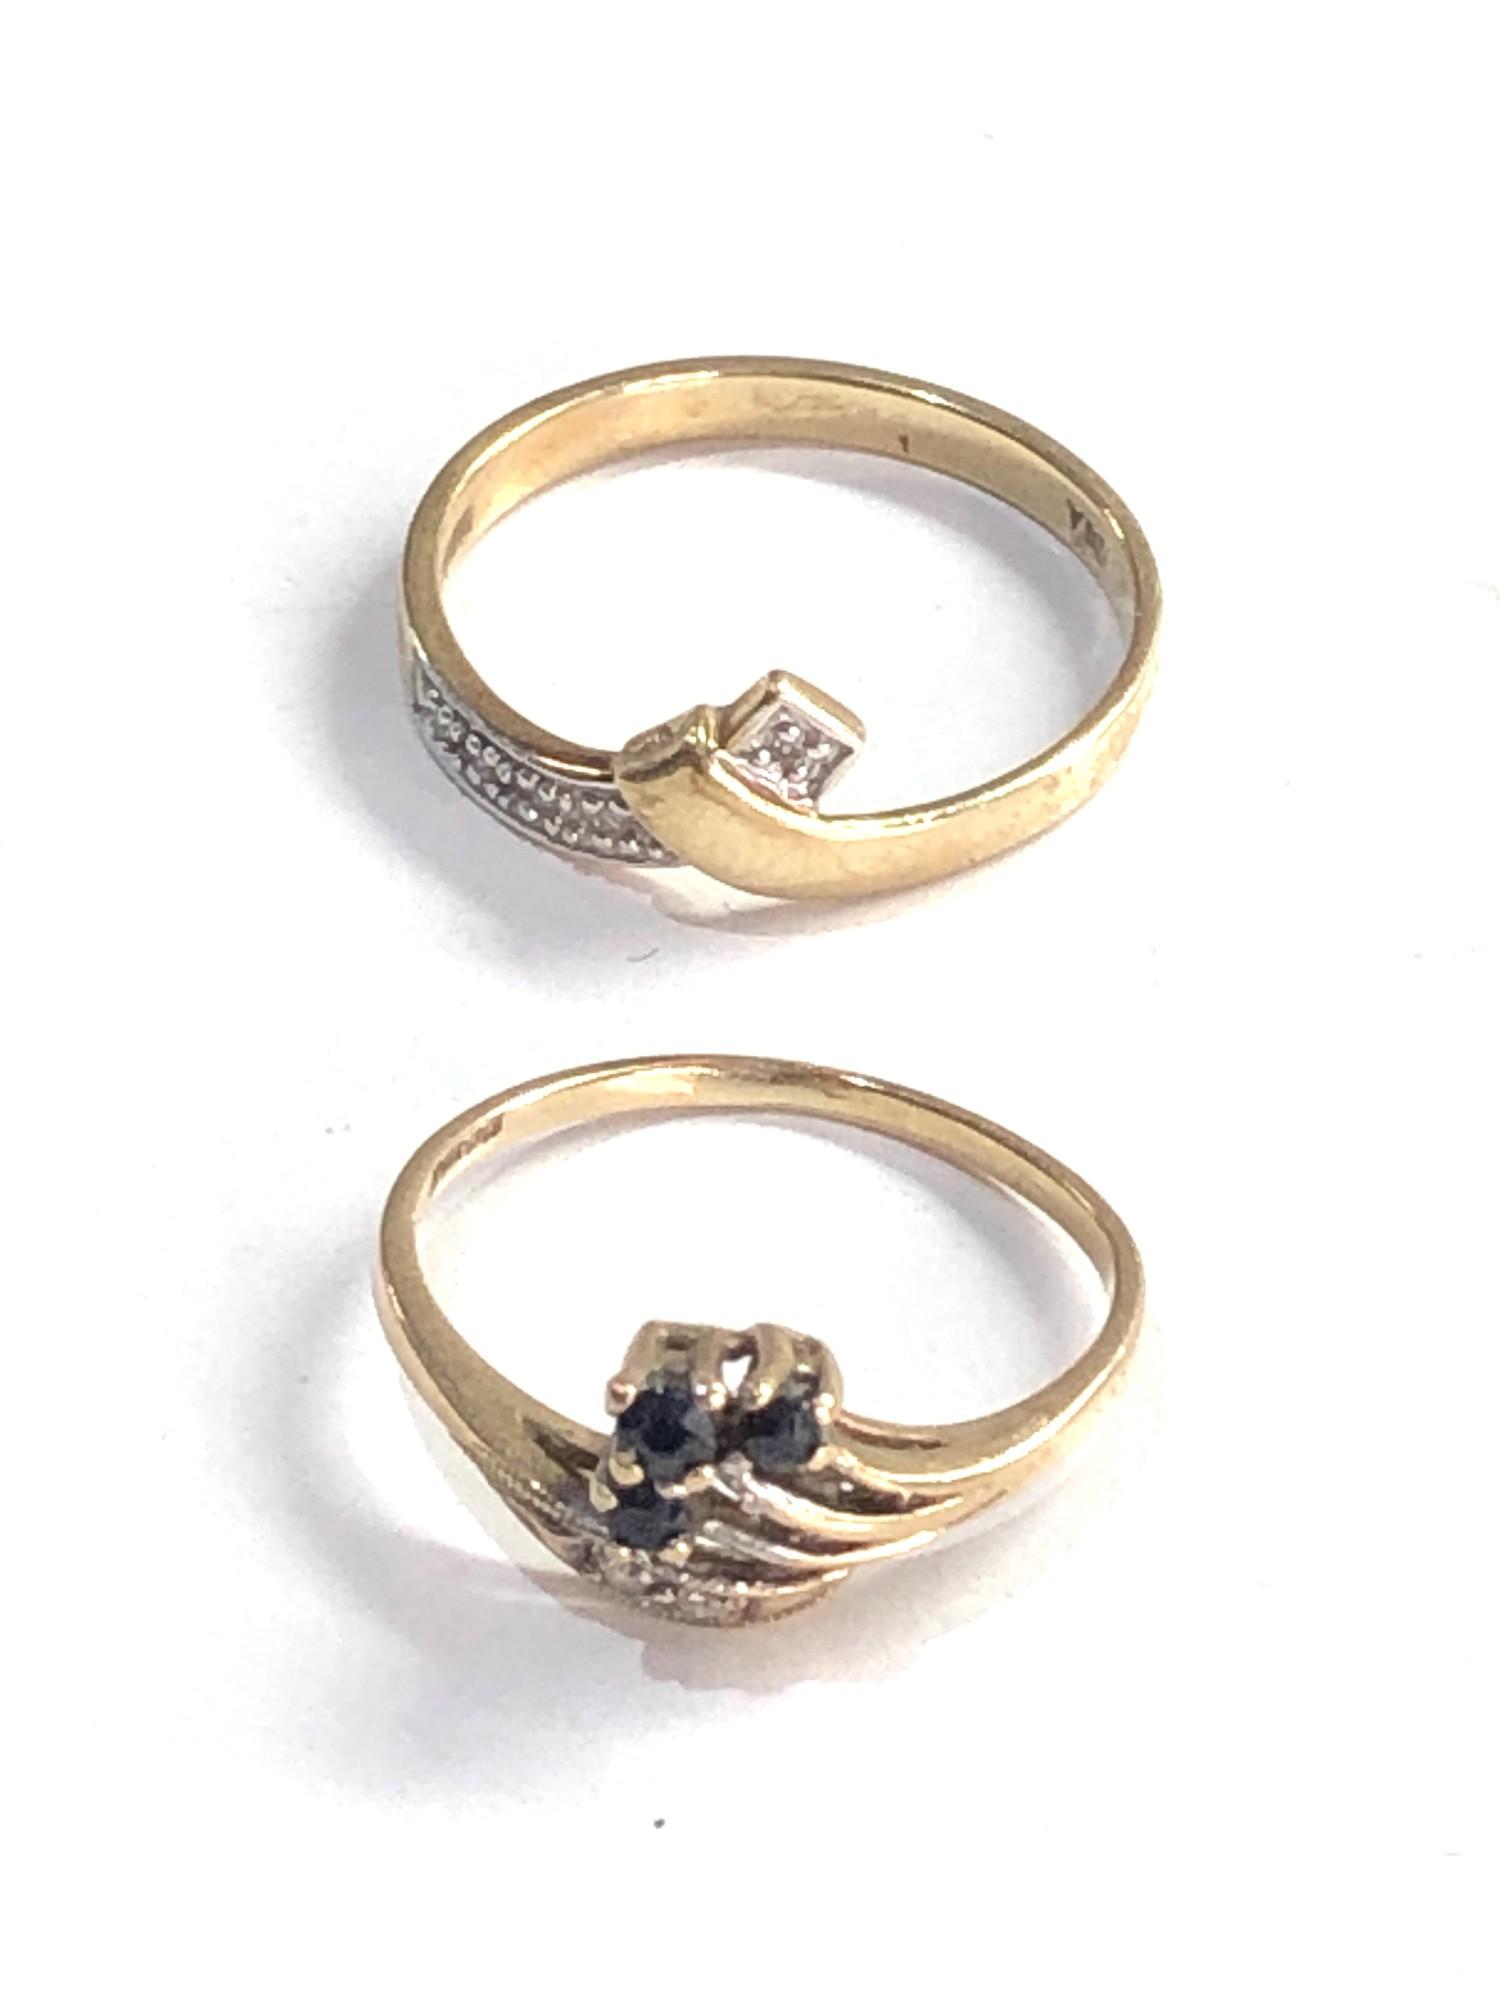 2 x 9ct gold diamond detail rings inc. sapphire 2.5g